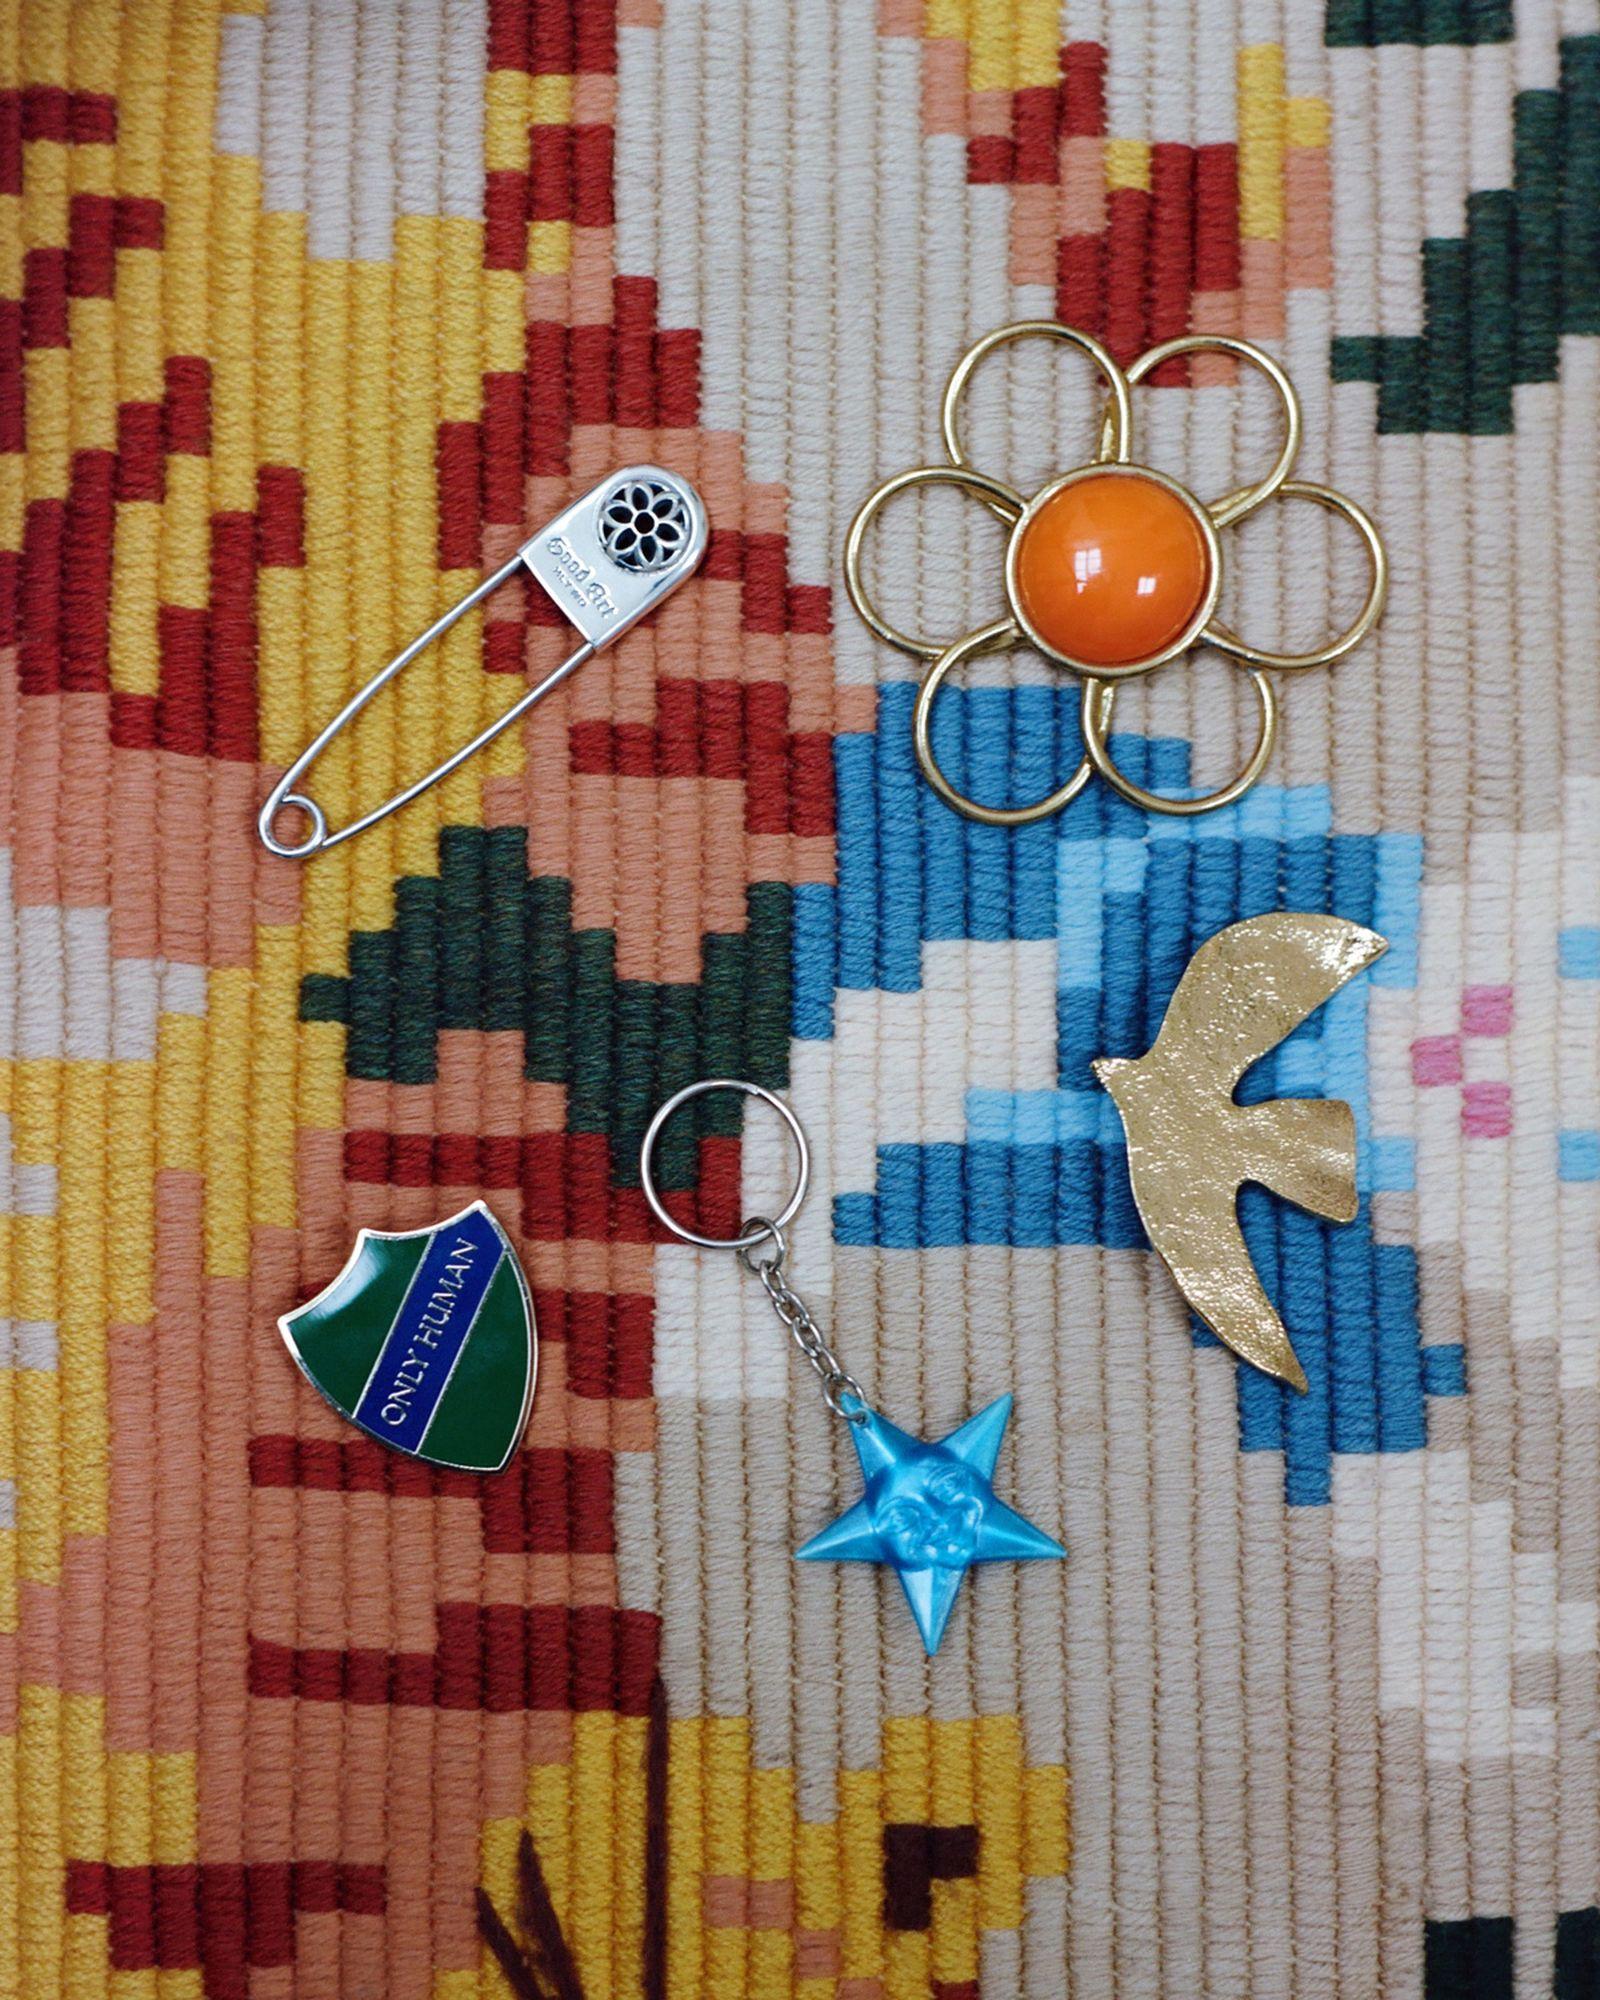 PinGOOD ART HLYWD, FlowerSTYLIST'S OWN, Bird brooch CECILE ET JEANNE, Star keyringEBAY, Only human school badgeTHAMES MMXX